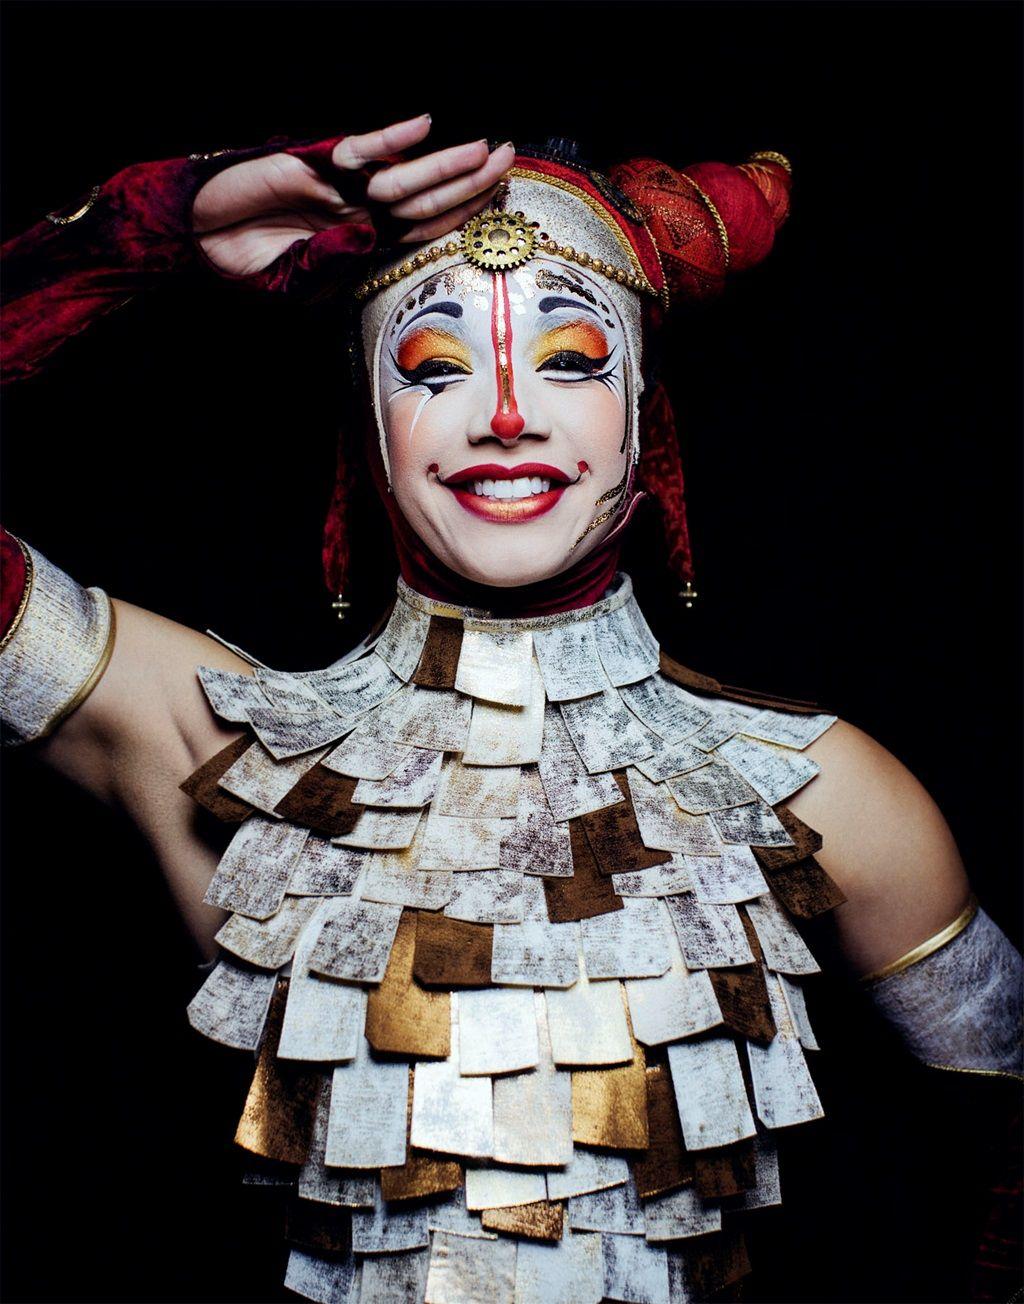 Photo Shoot with Cirque du Soleil for Allure Magazine